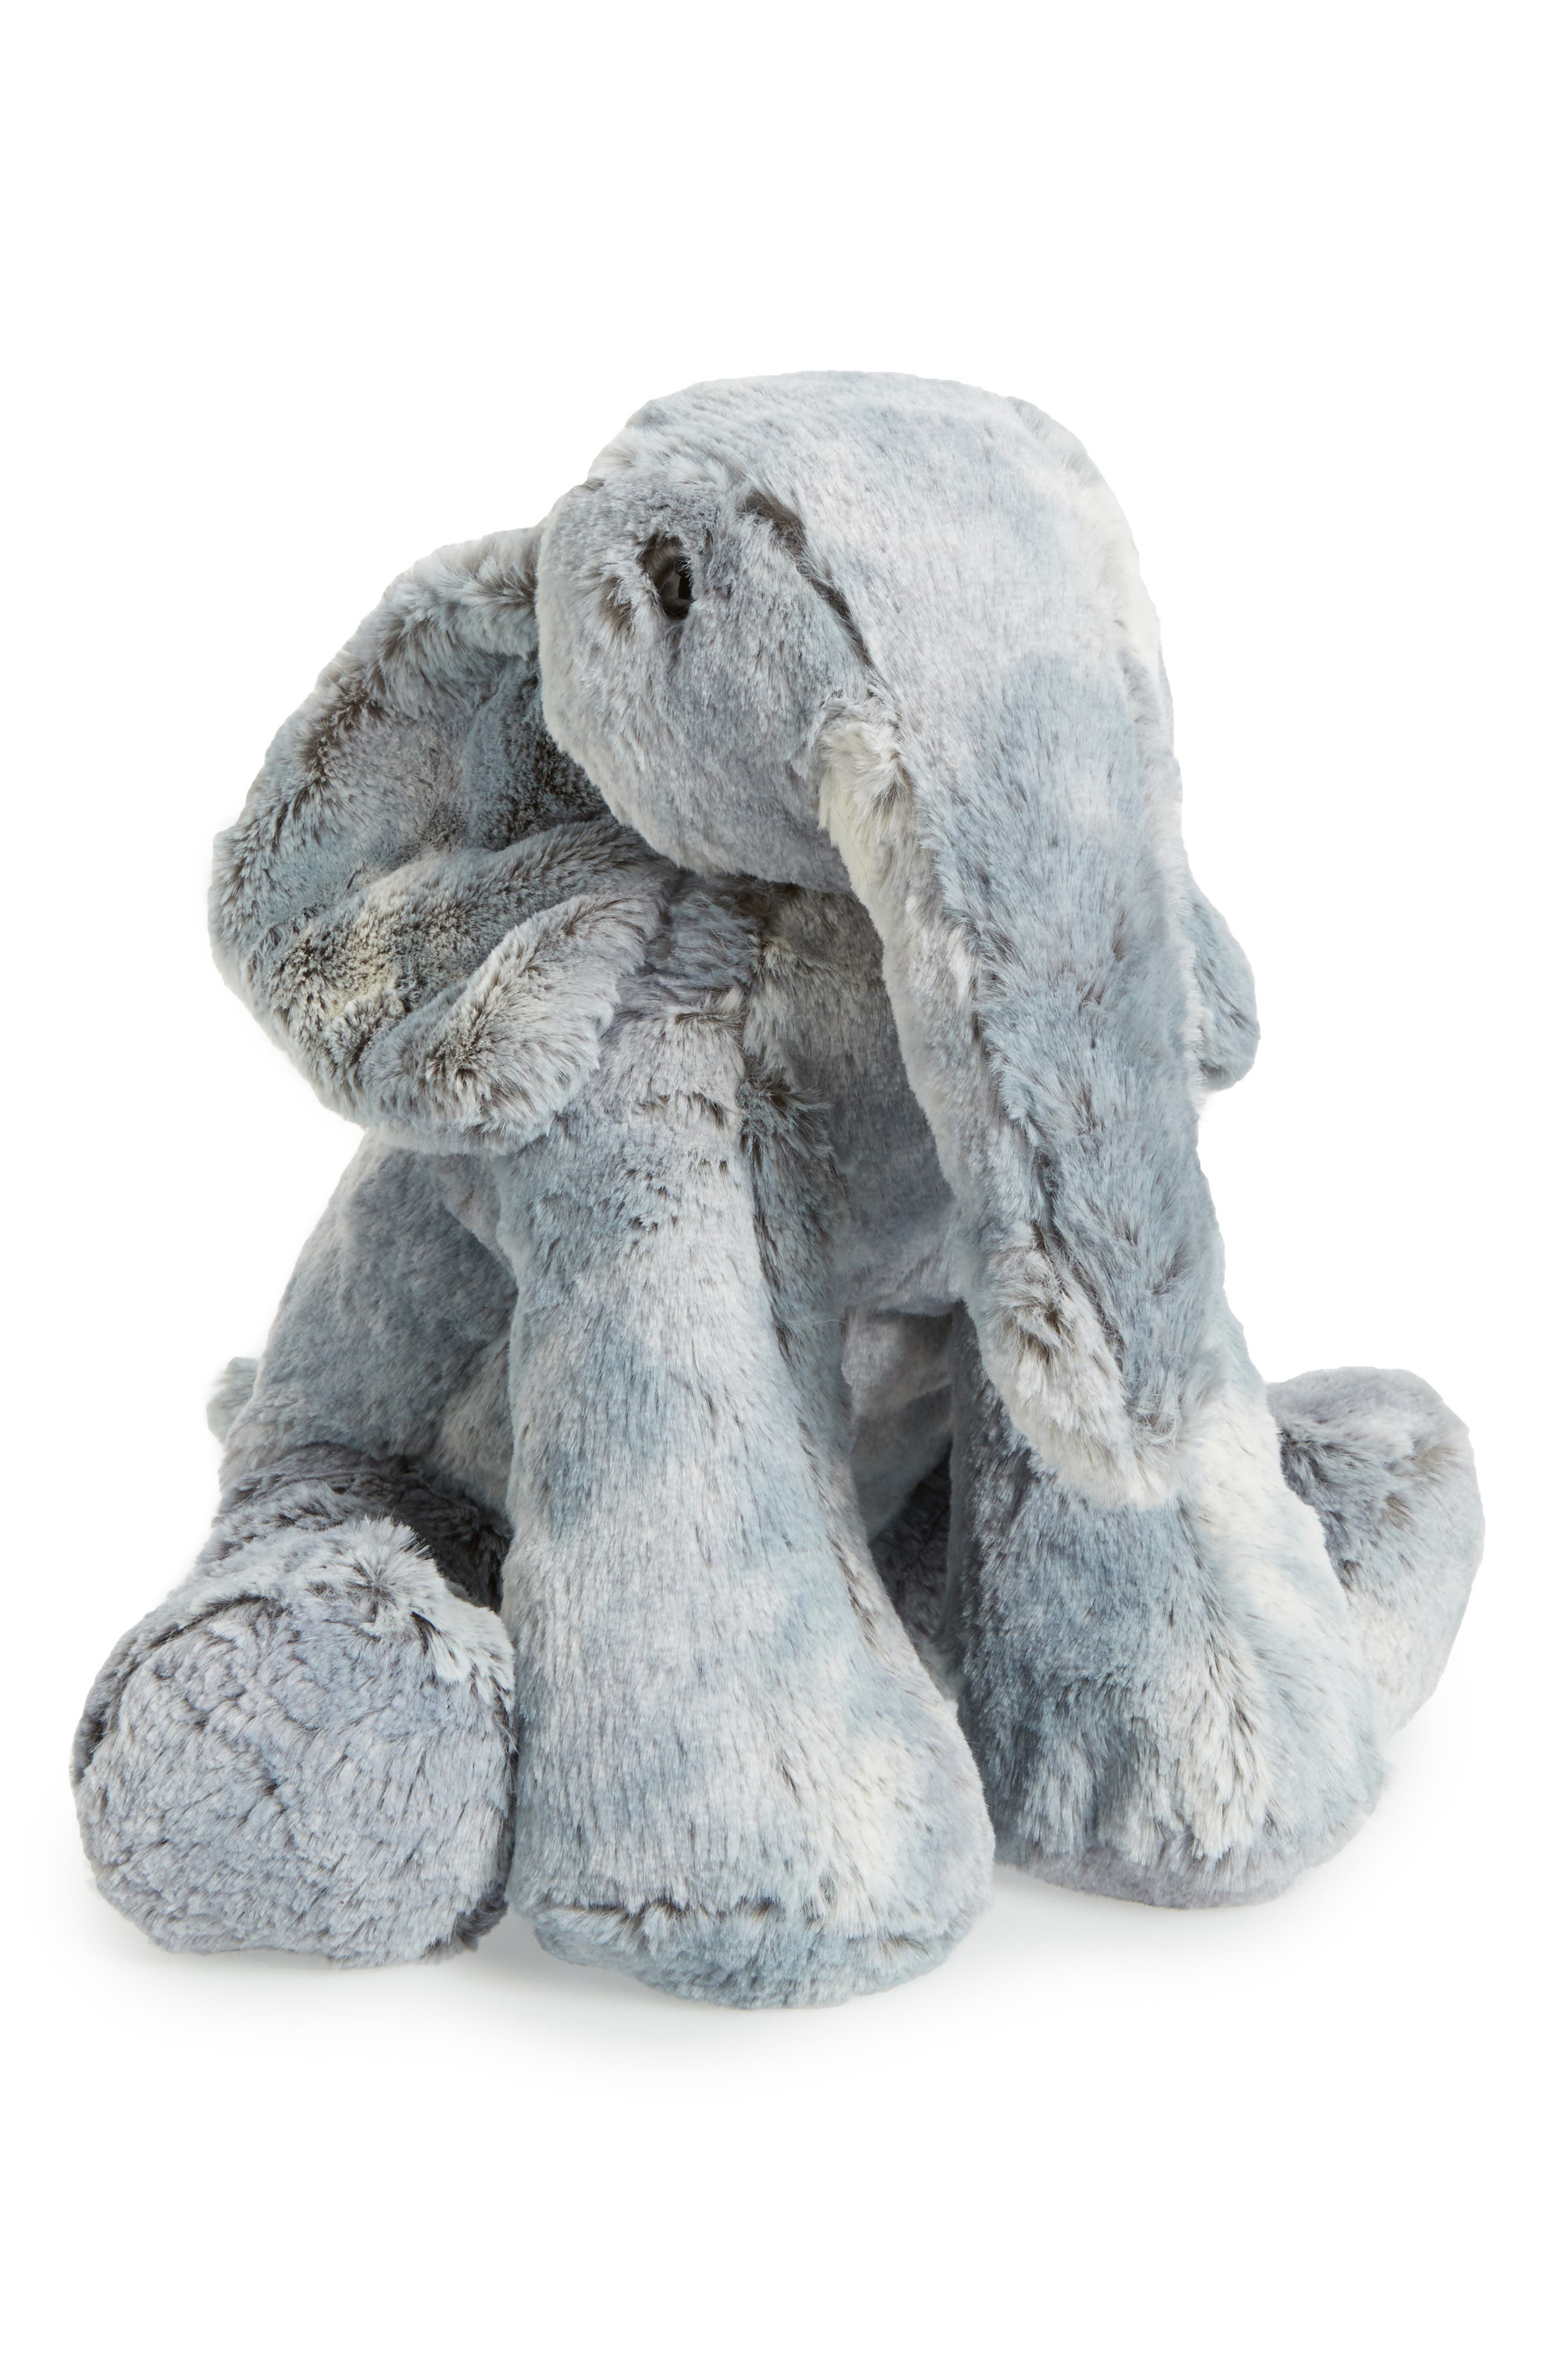 Elly Elephant Stuffed Animal,                             Main thumbnail 1, color,                             020